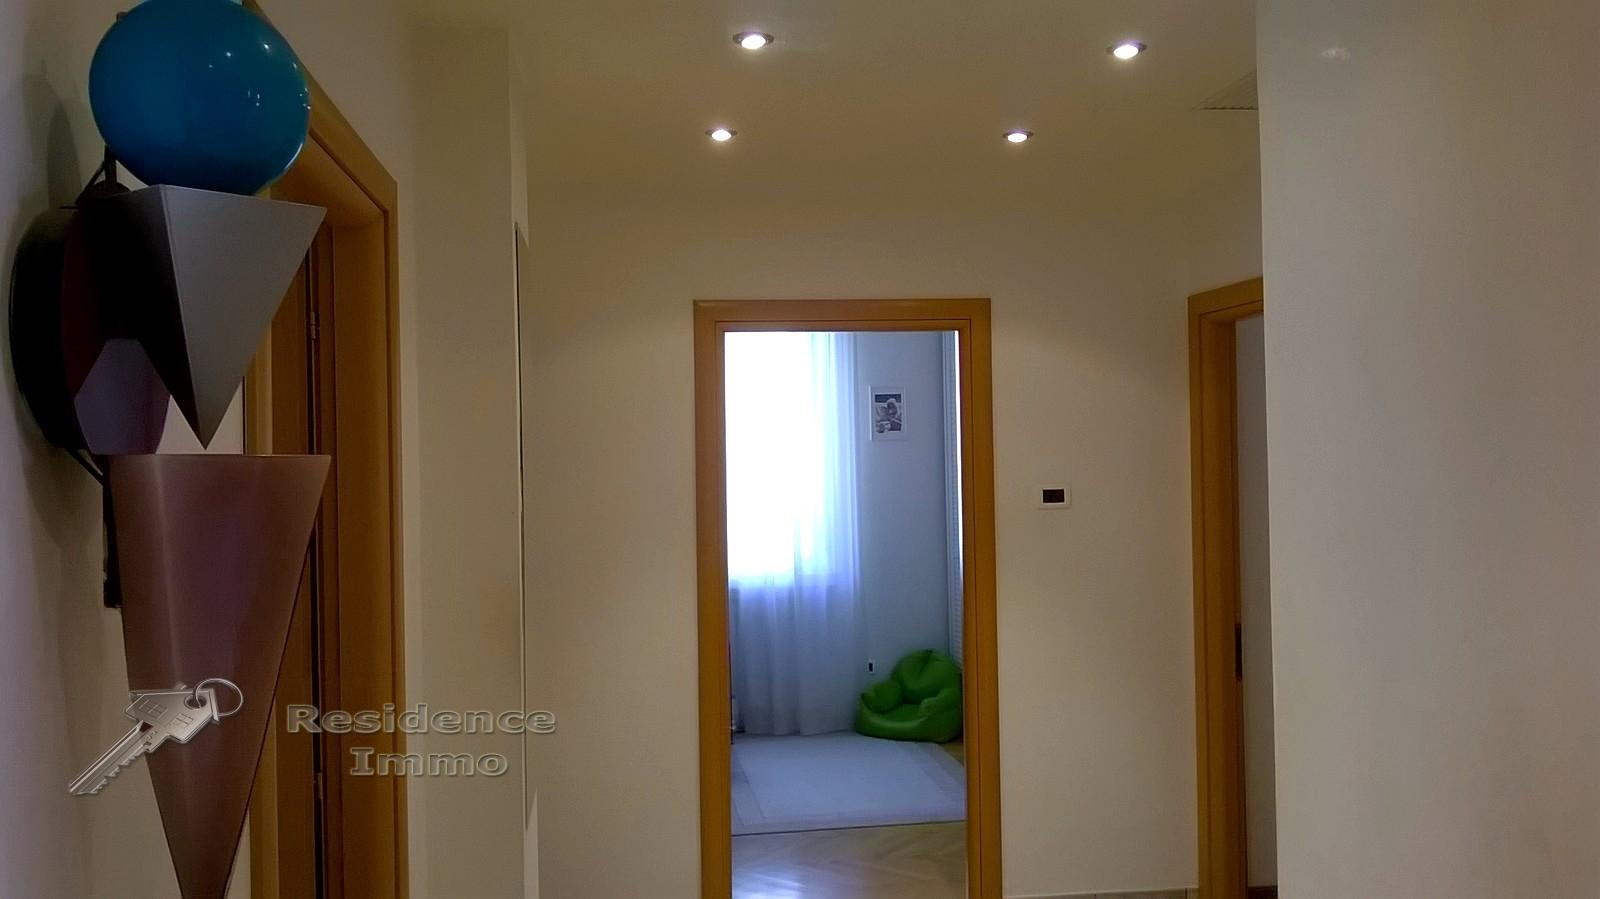 wohnung kaufen in bolzano bozen kodex 16381. Black Bedroom Furniture Sets. Home Design Ideas